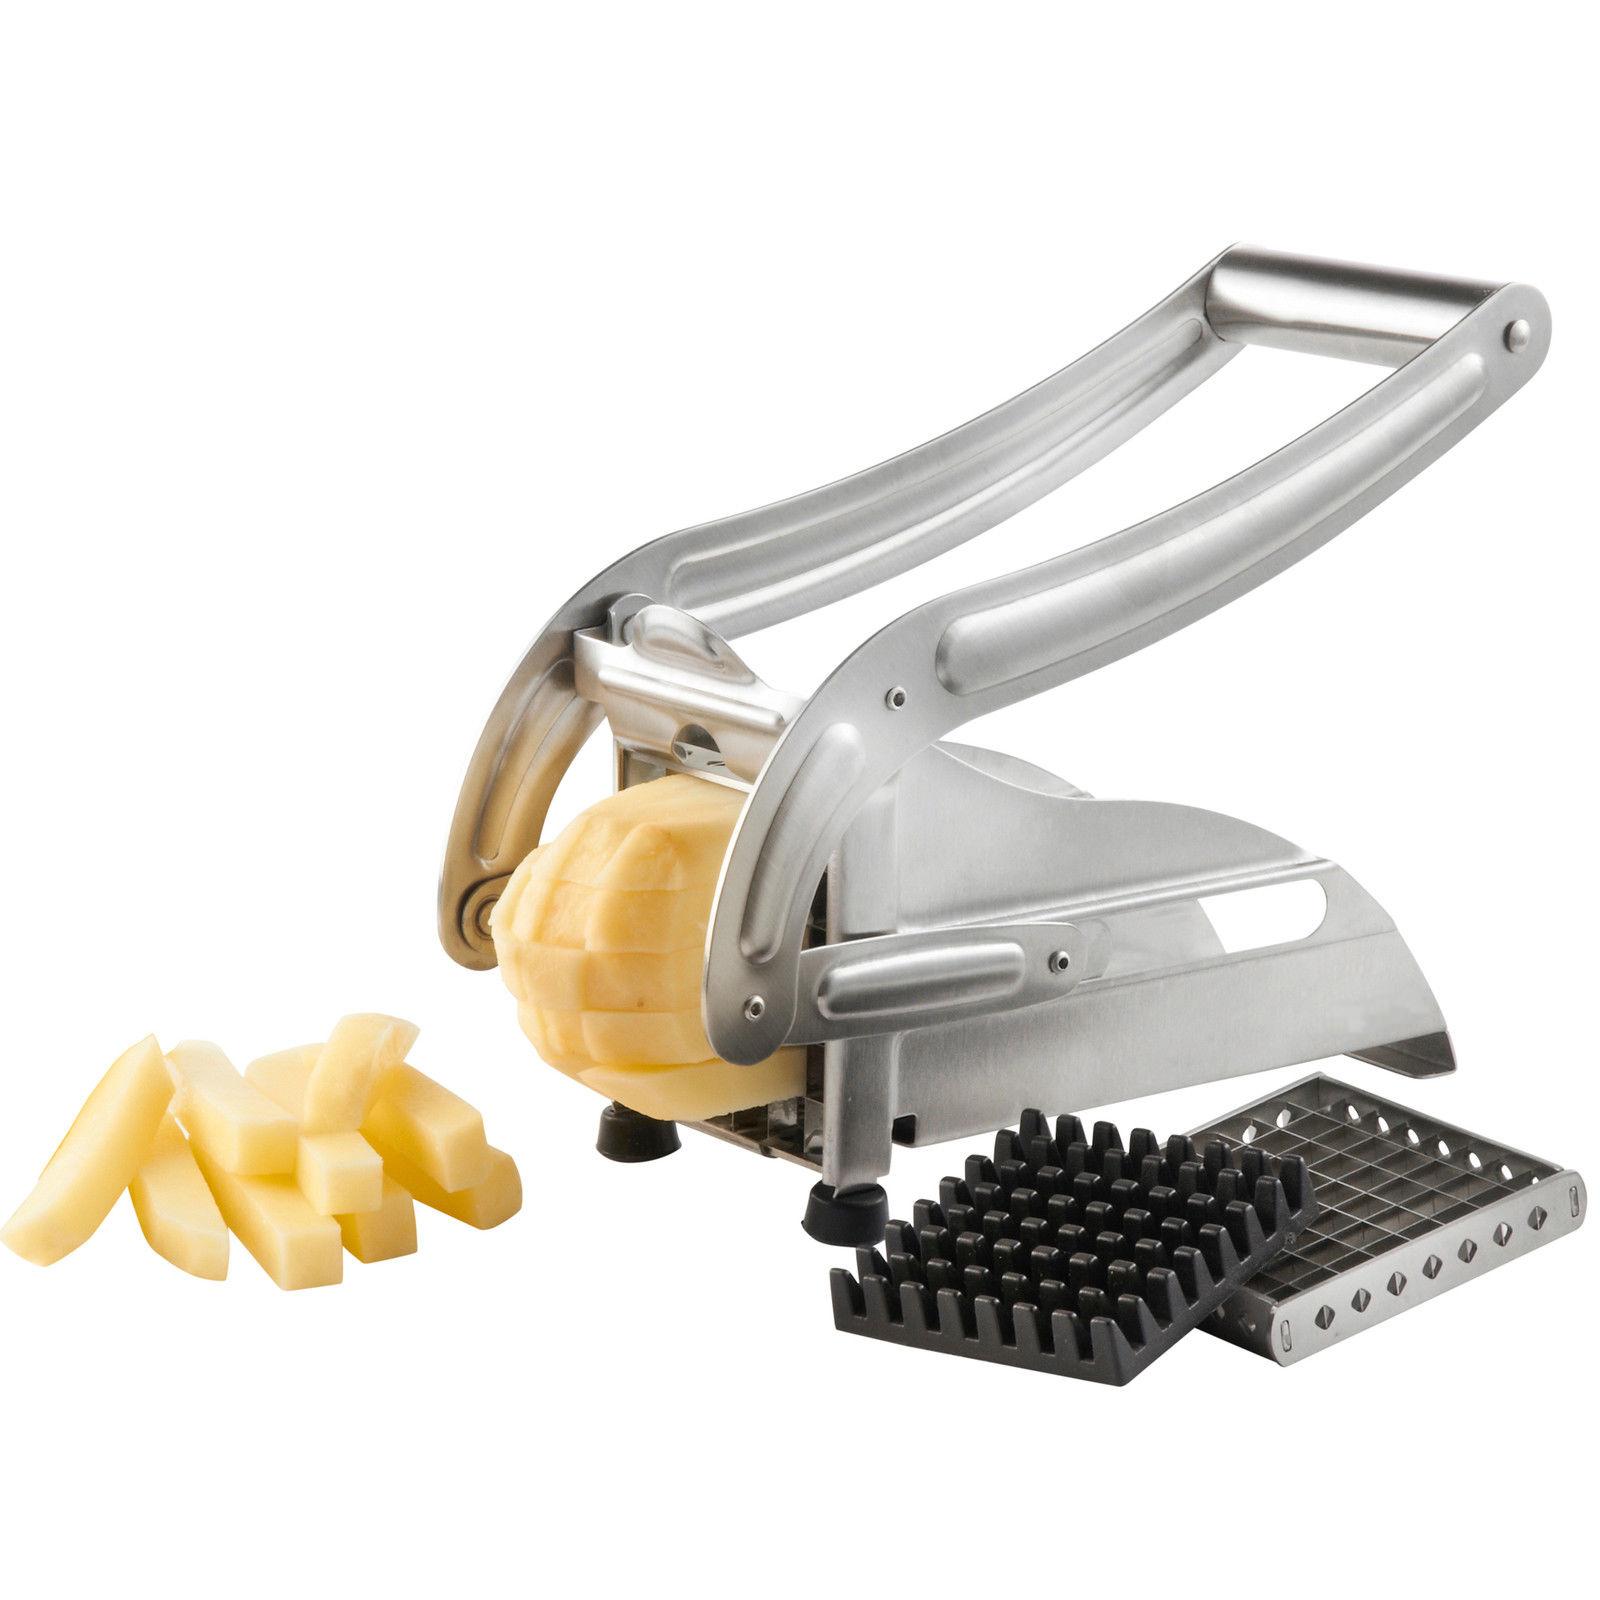 Kabalo Stainless Steel Potato Chips French Fries Chipper Slicer Cutter Chopper